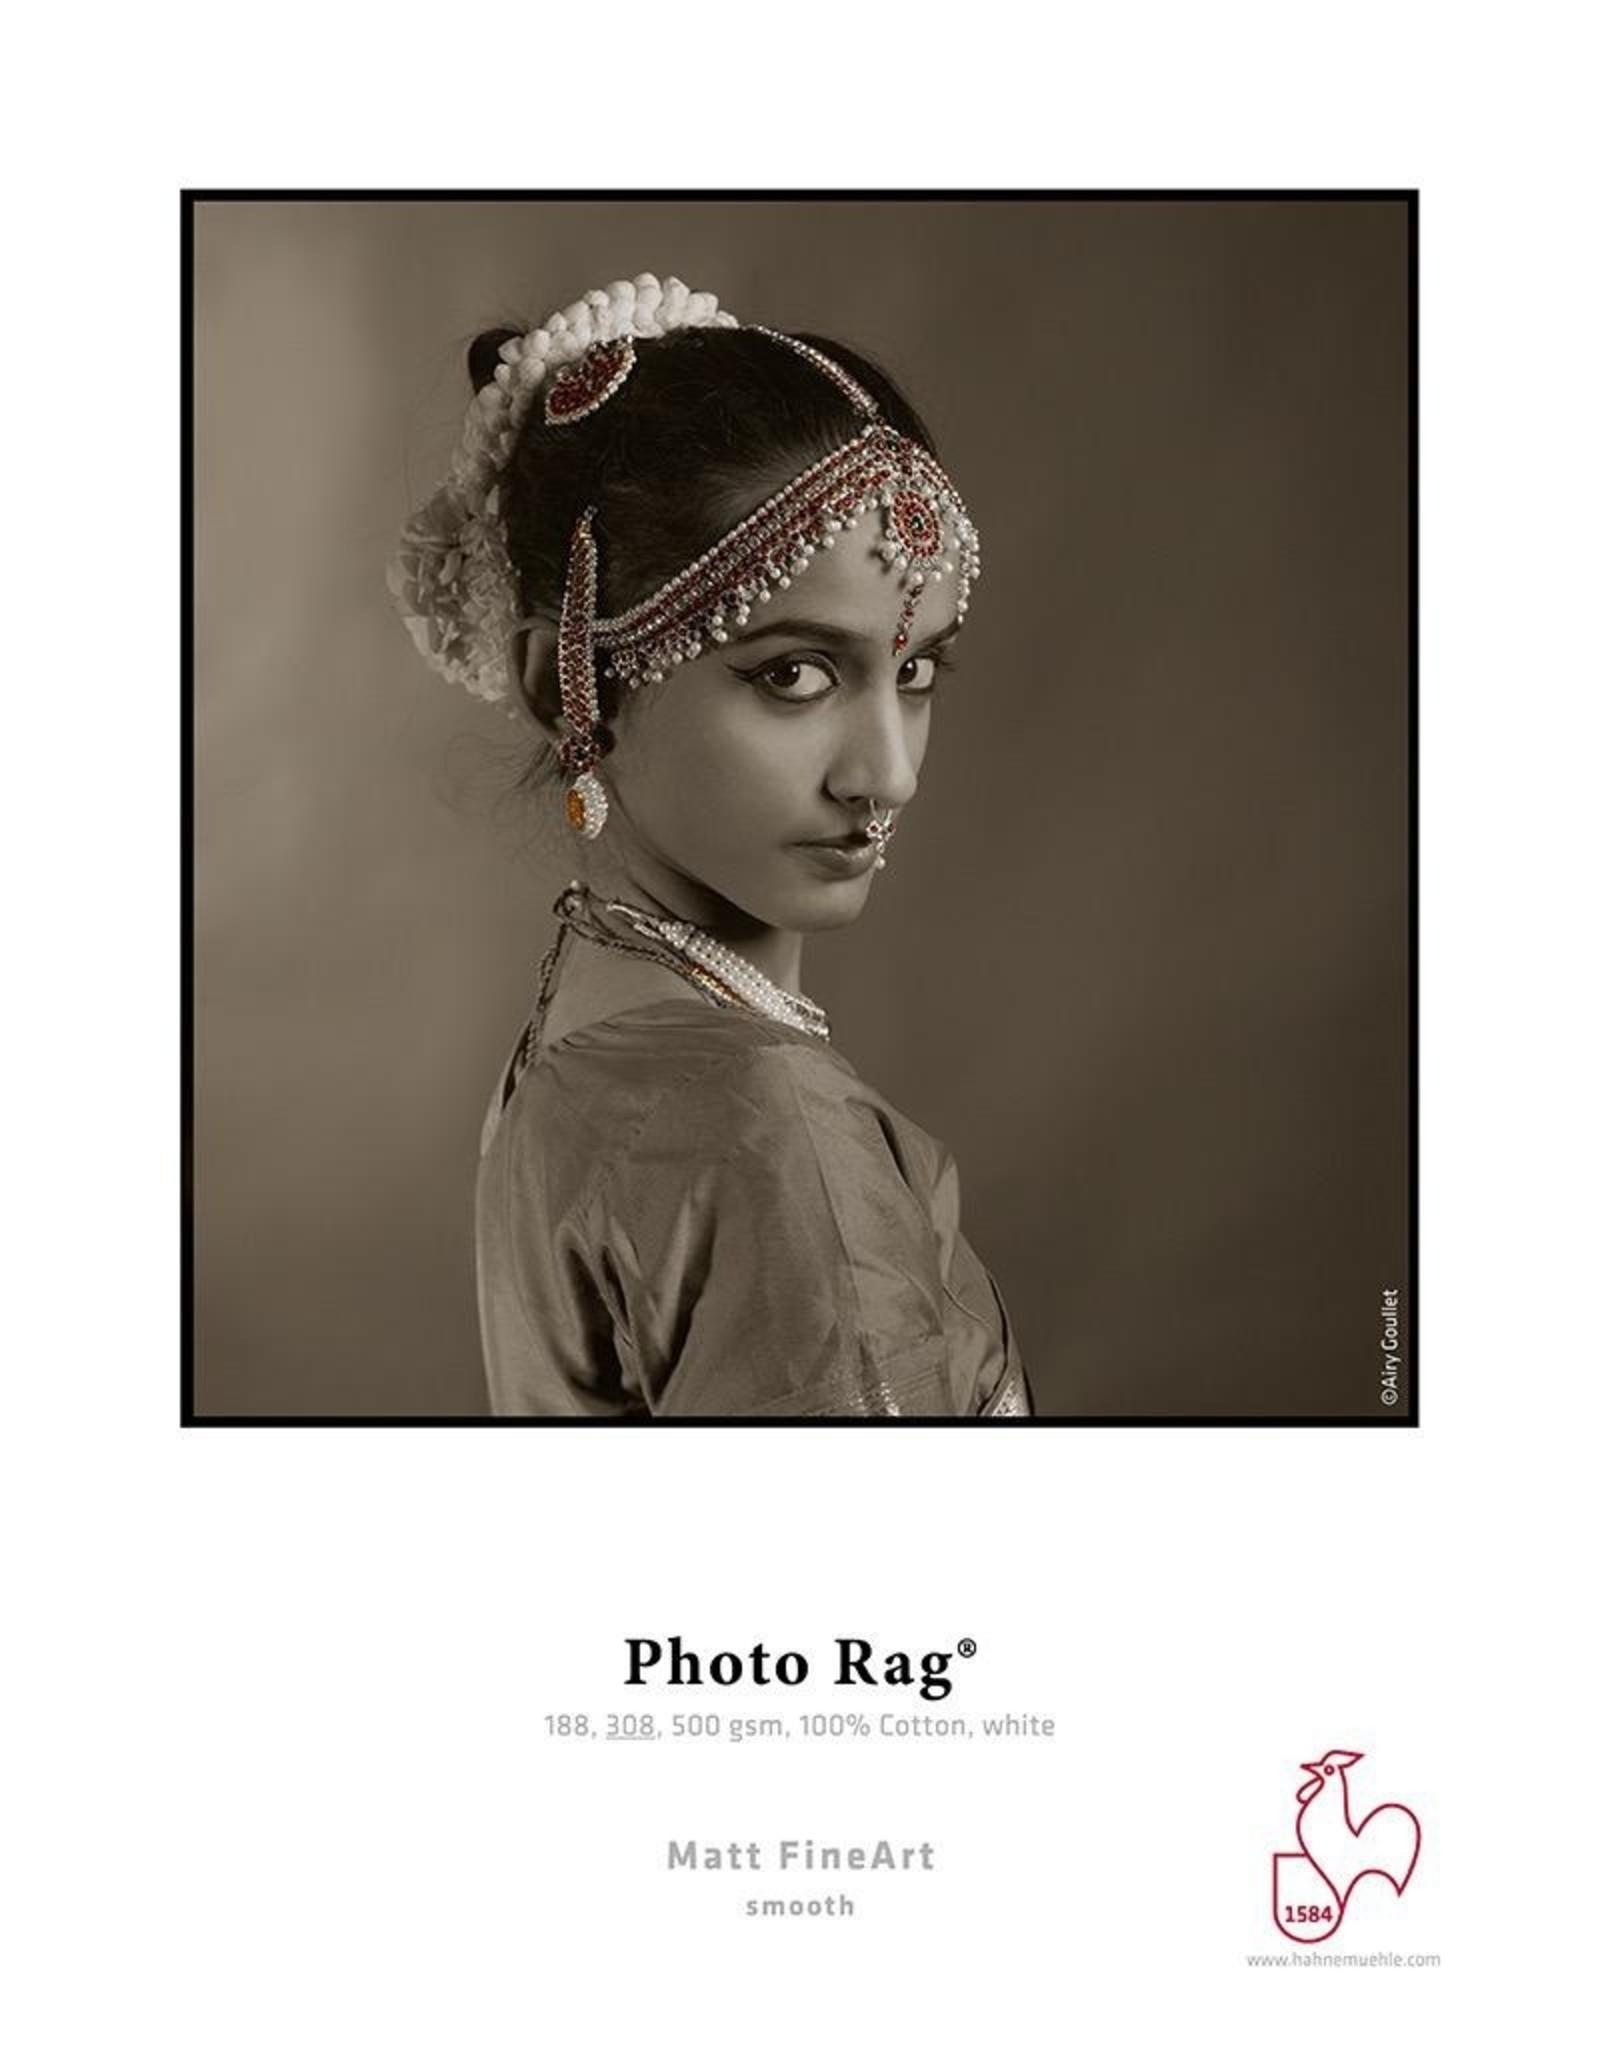 "Hahnemuhle Hahnemuhle Photo Rag® 308gsm 24"" x 39' Roll, 3"" core"